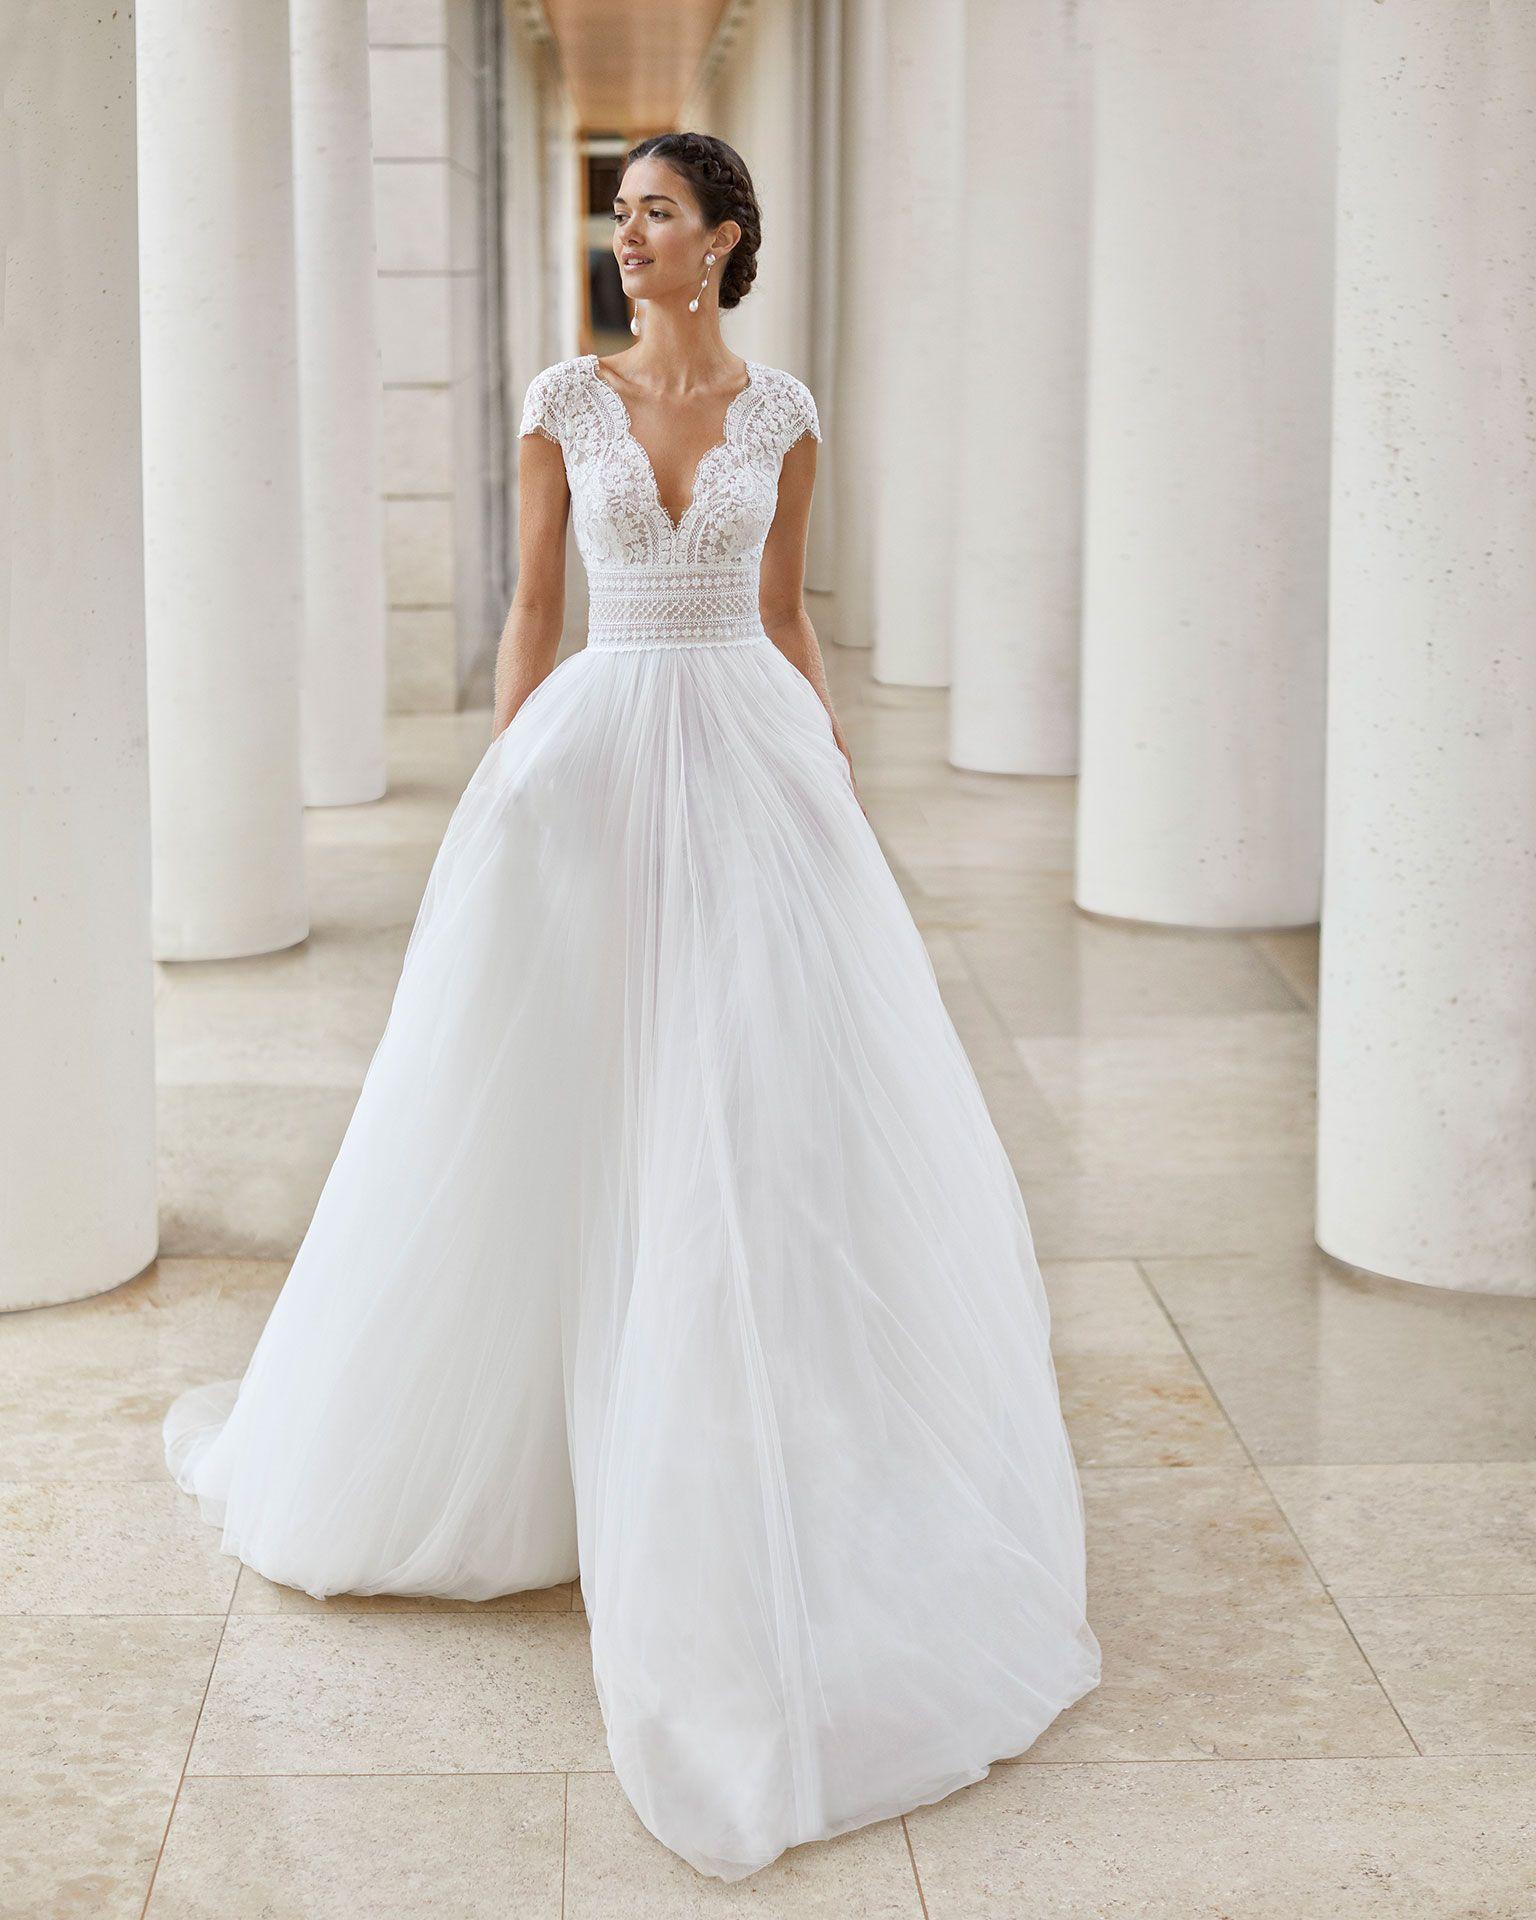 Sauca Bridal 2020 Rosa Clara Couture Collection Wedding Dresses Lace Wedding Dress Trends Wedding Dresses